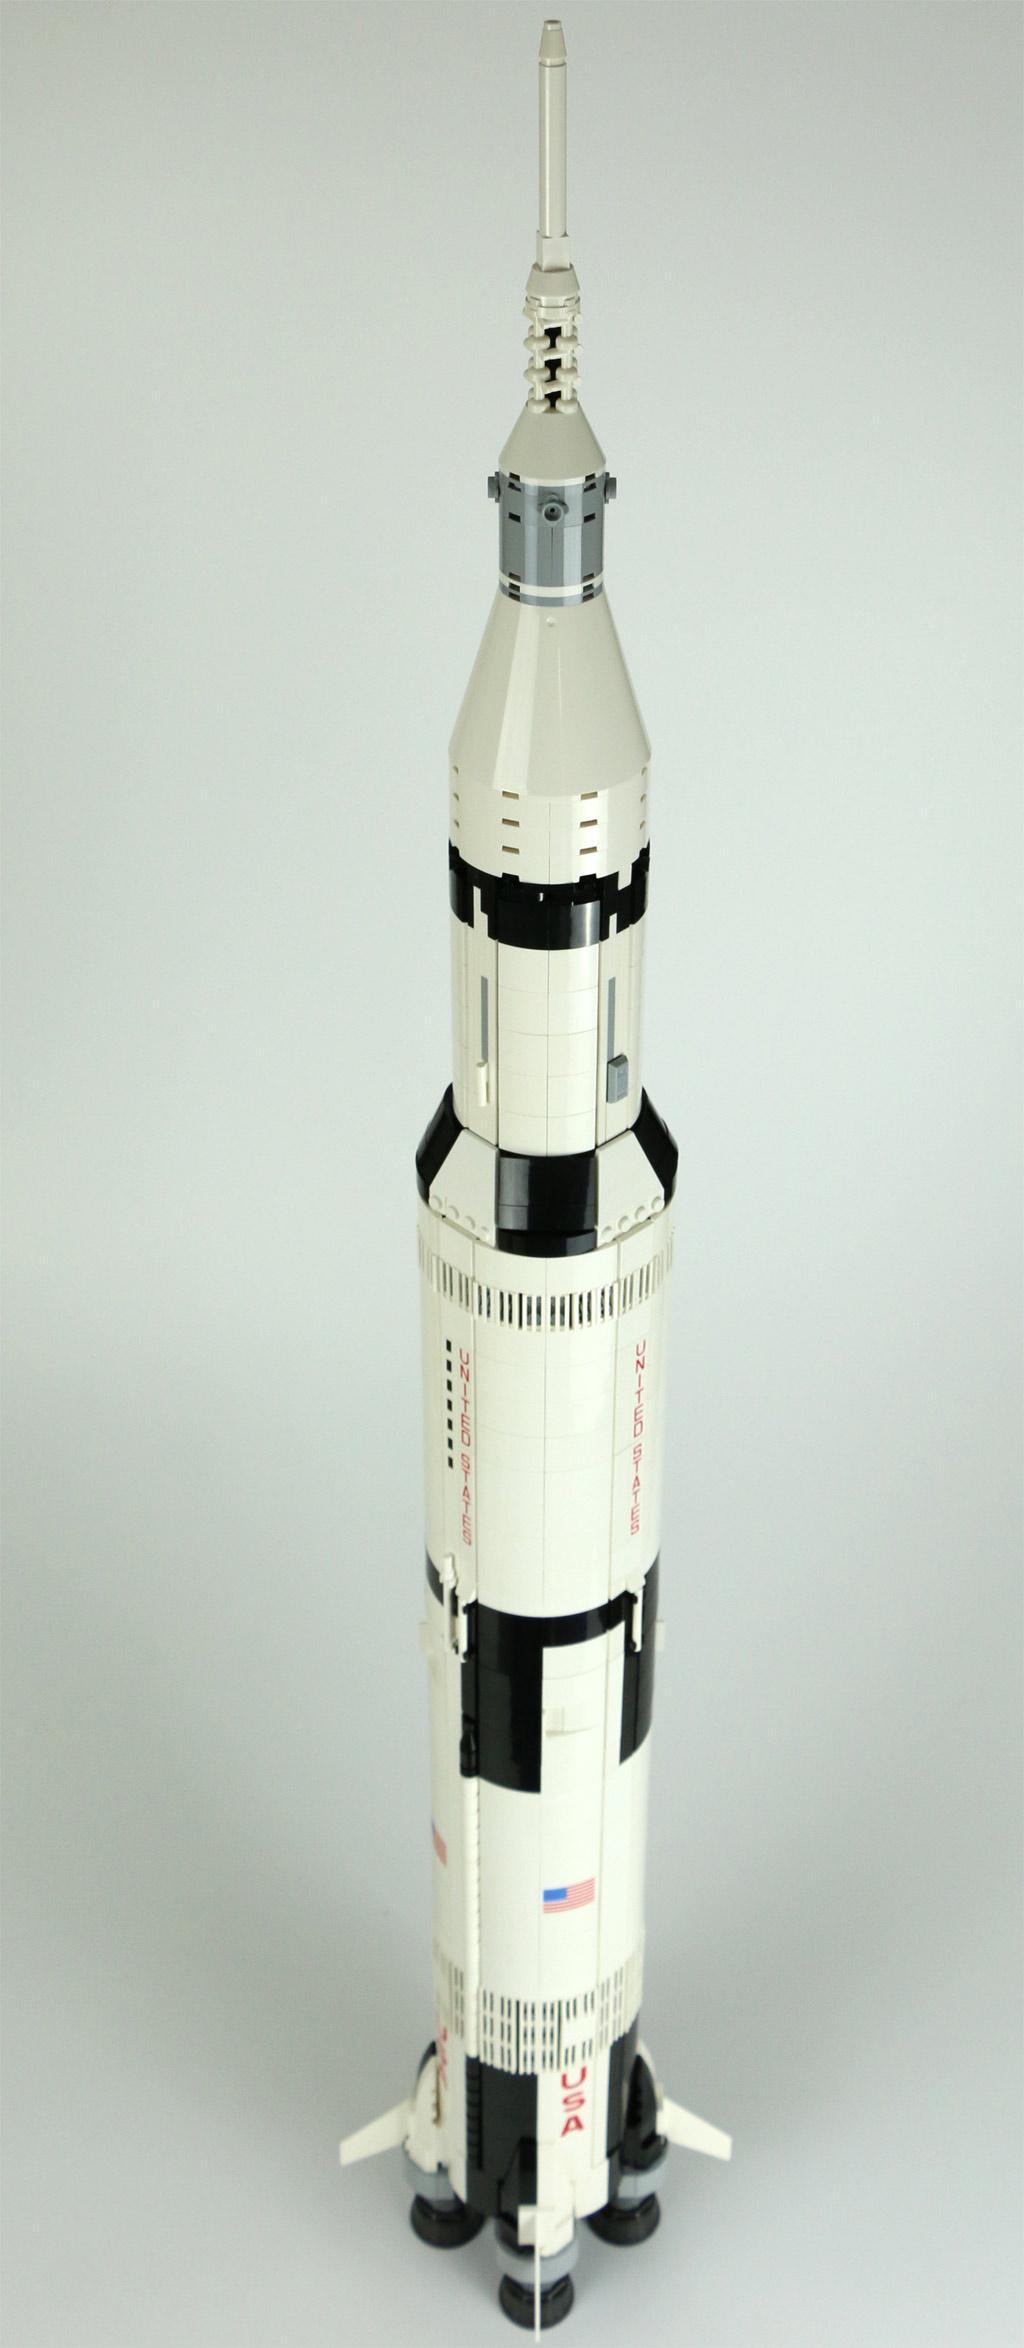 lego-ideas-nasa-apollo-saturn-v-21309-rakete-2017-zusammengebaut-andres-lehmann zusammengebaut.com